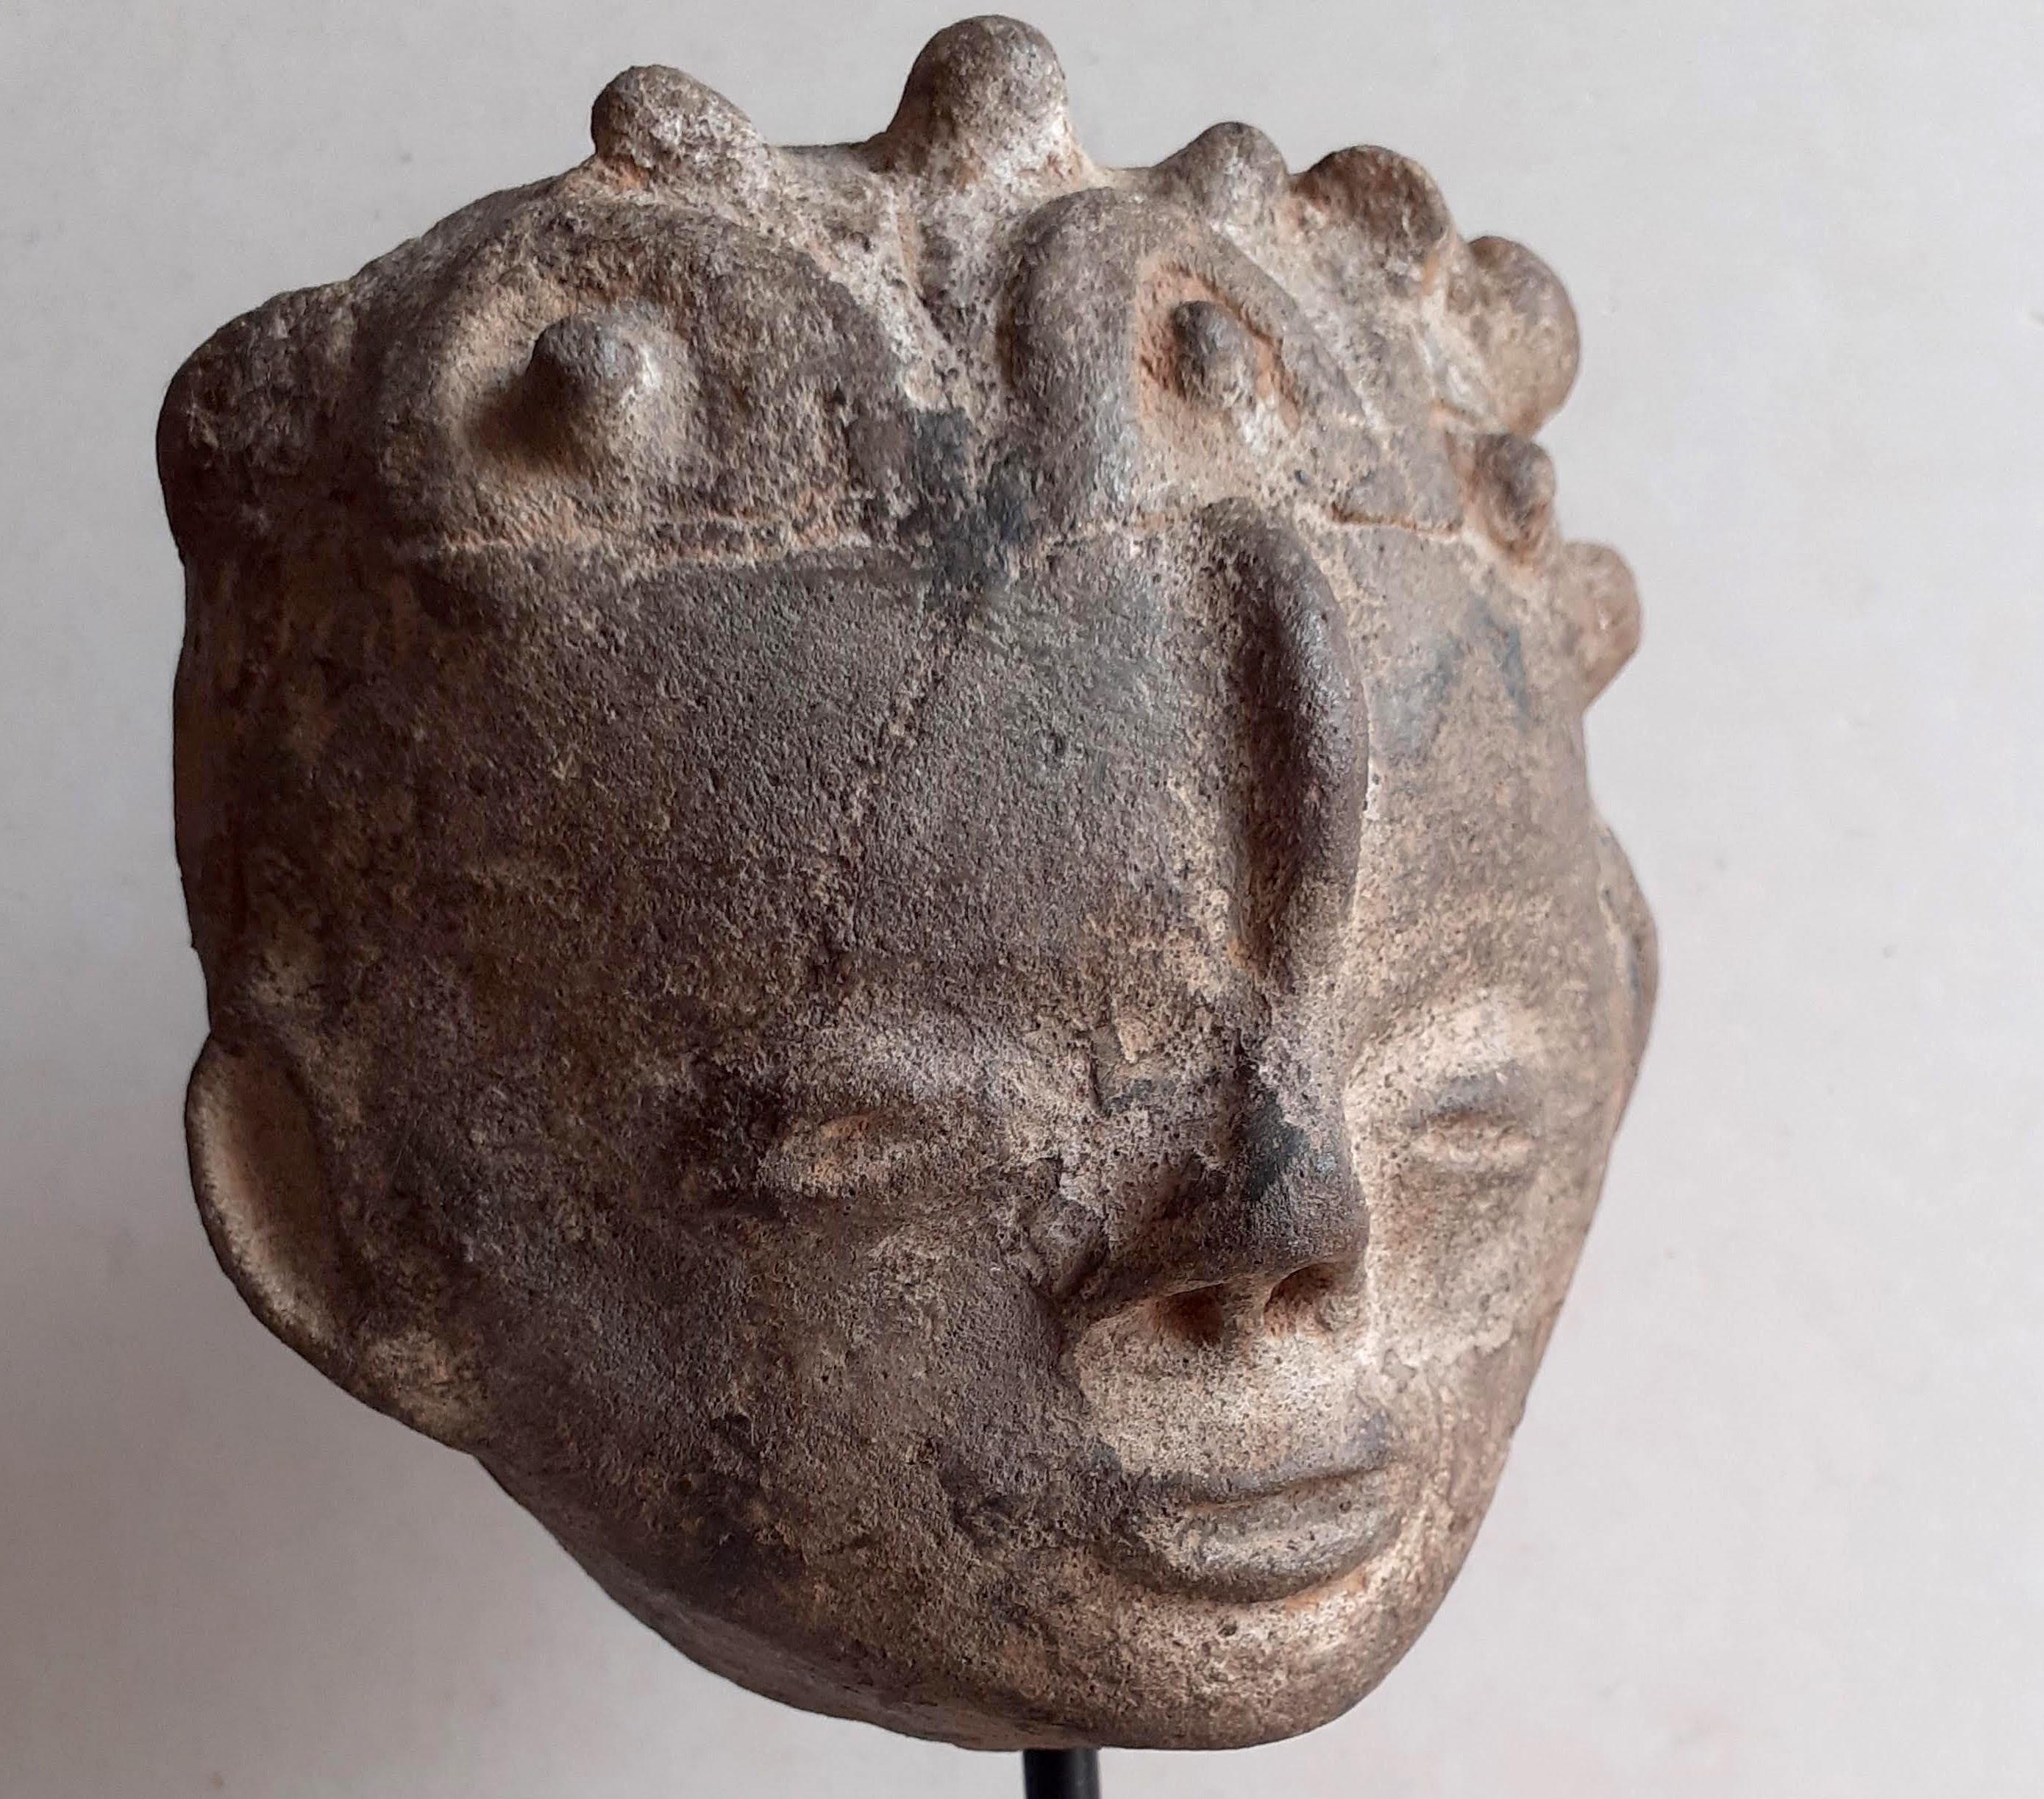 Akan Ashanti Memorial Portrait Head of a Noble Tribal African Art Sculpture